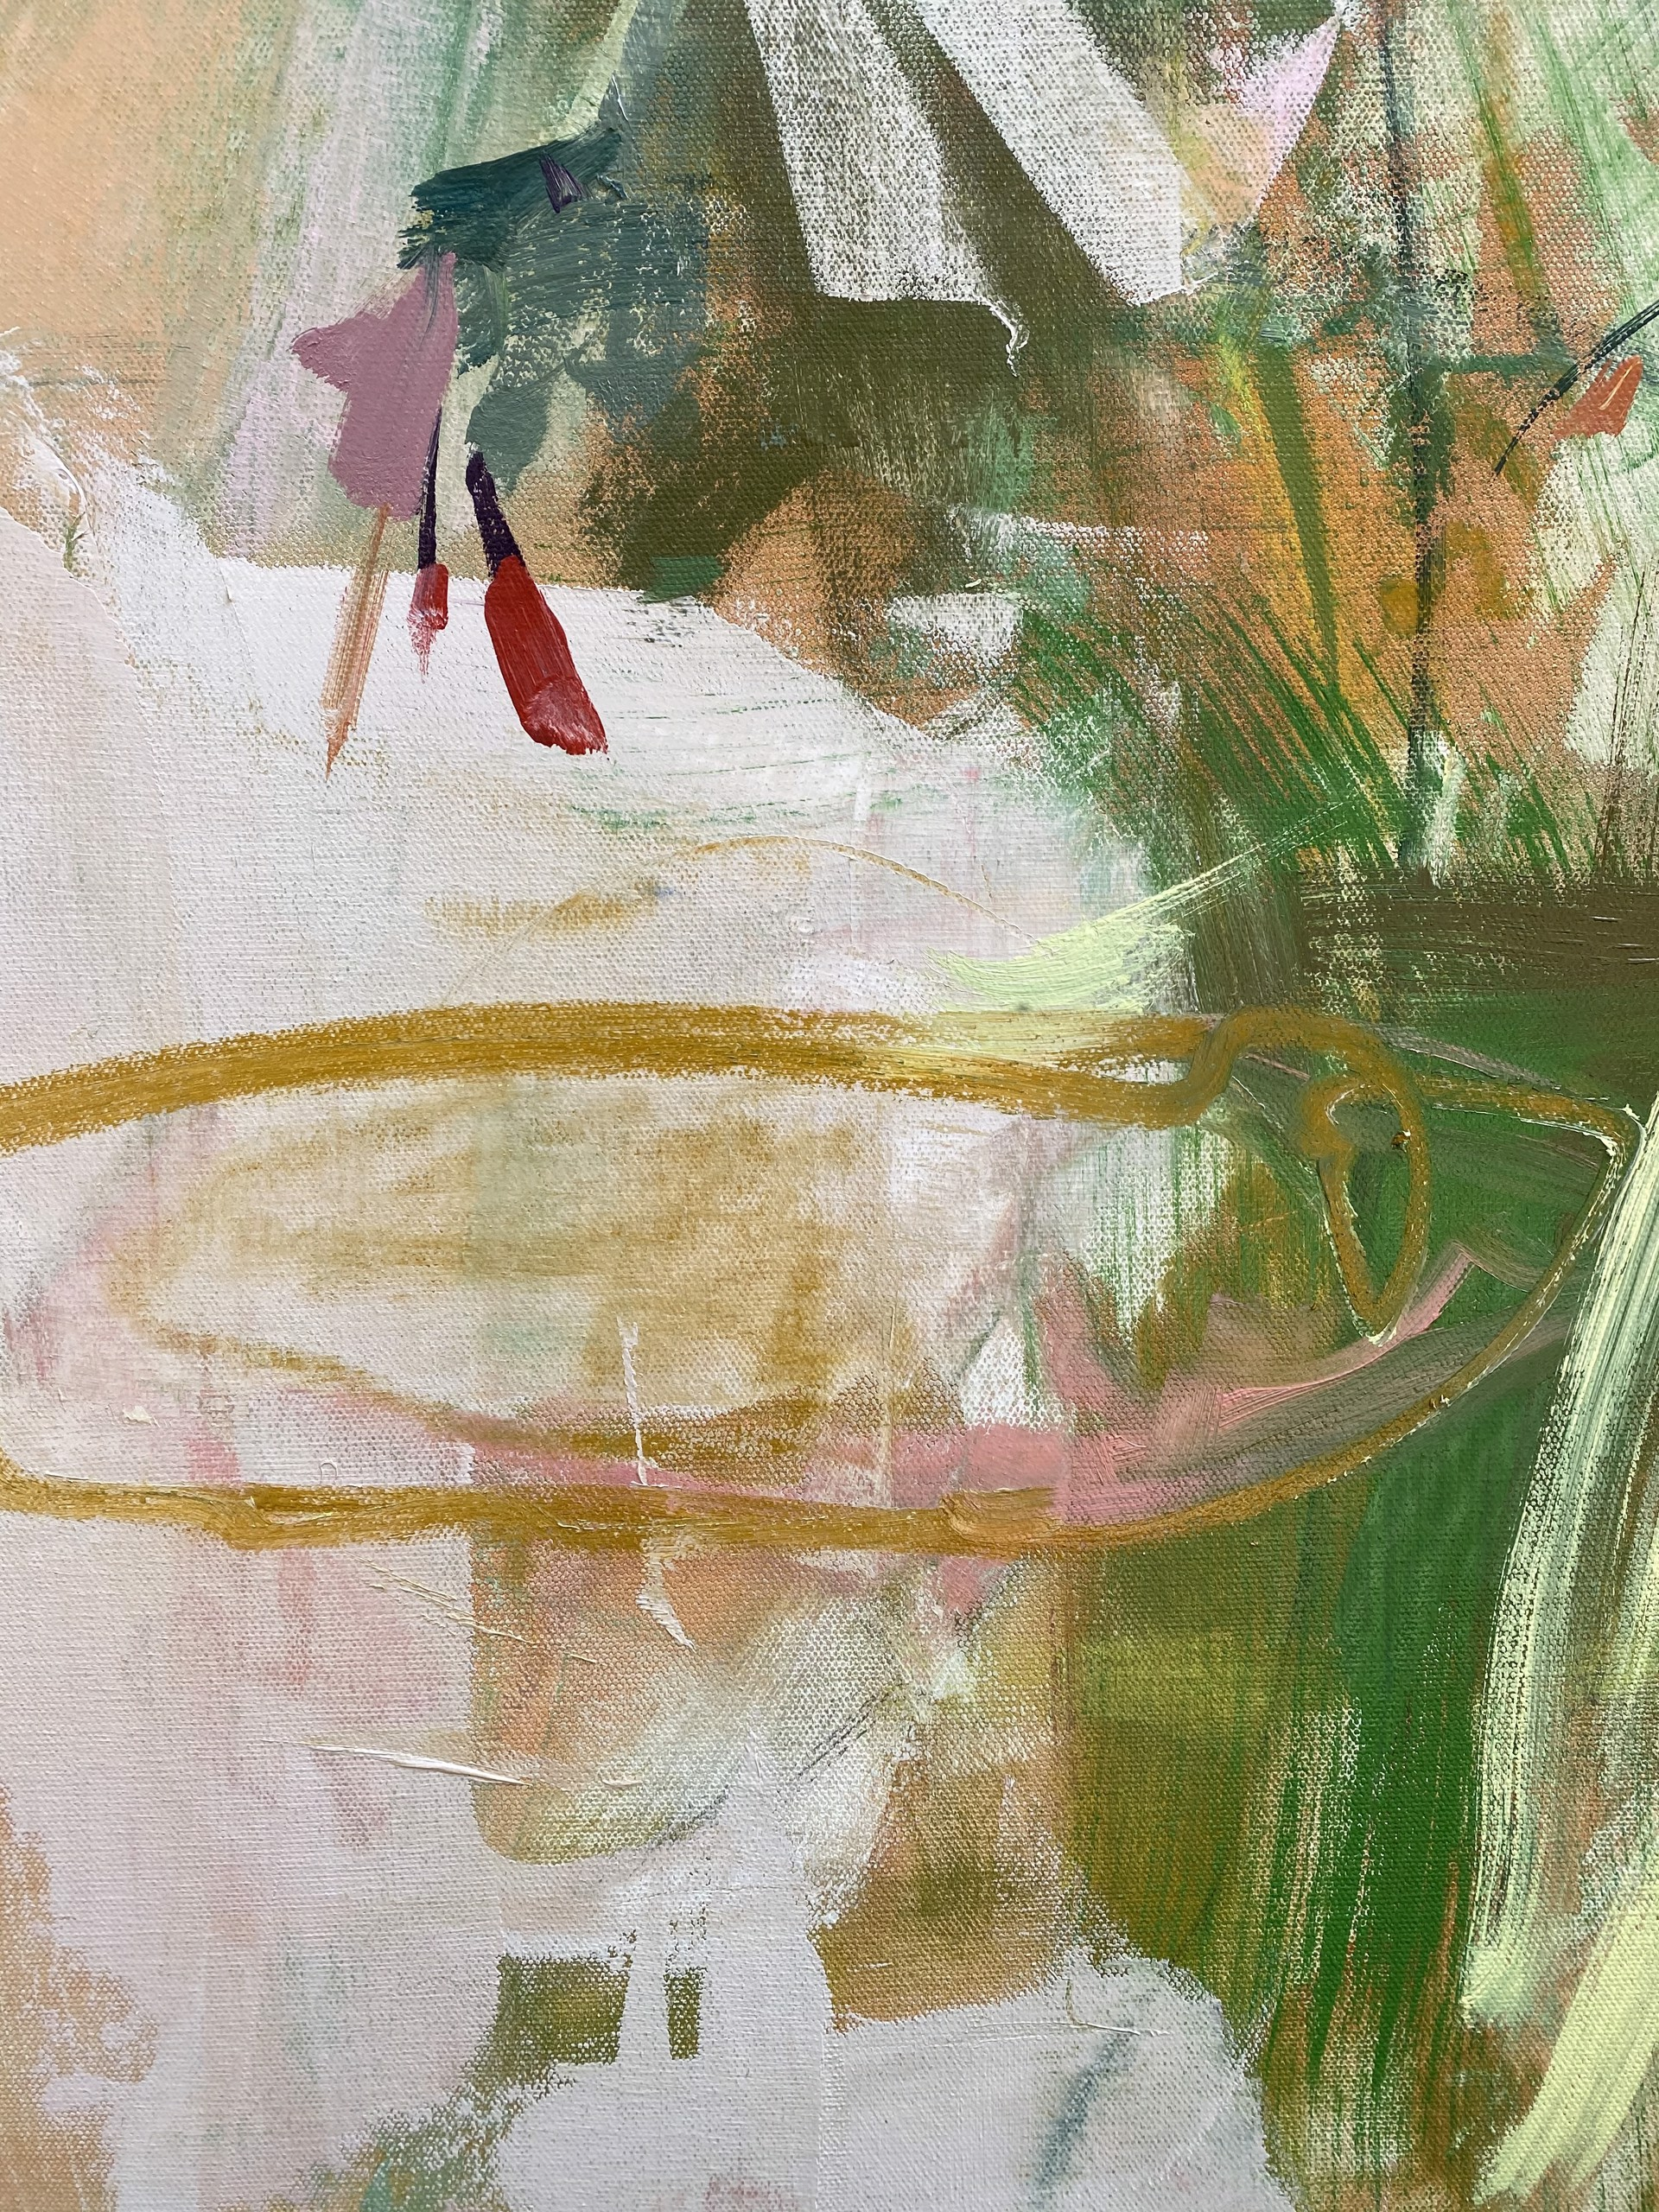 Hostas and Salvia by Marissa Vogl